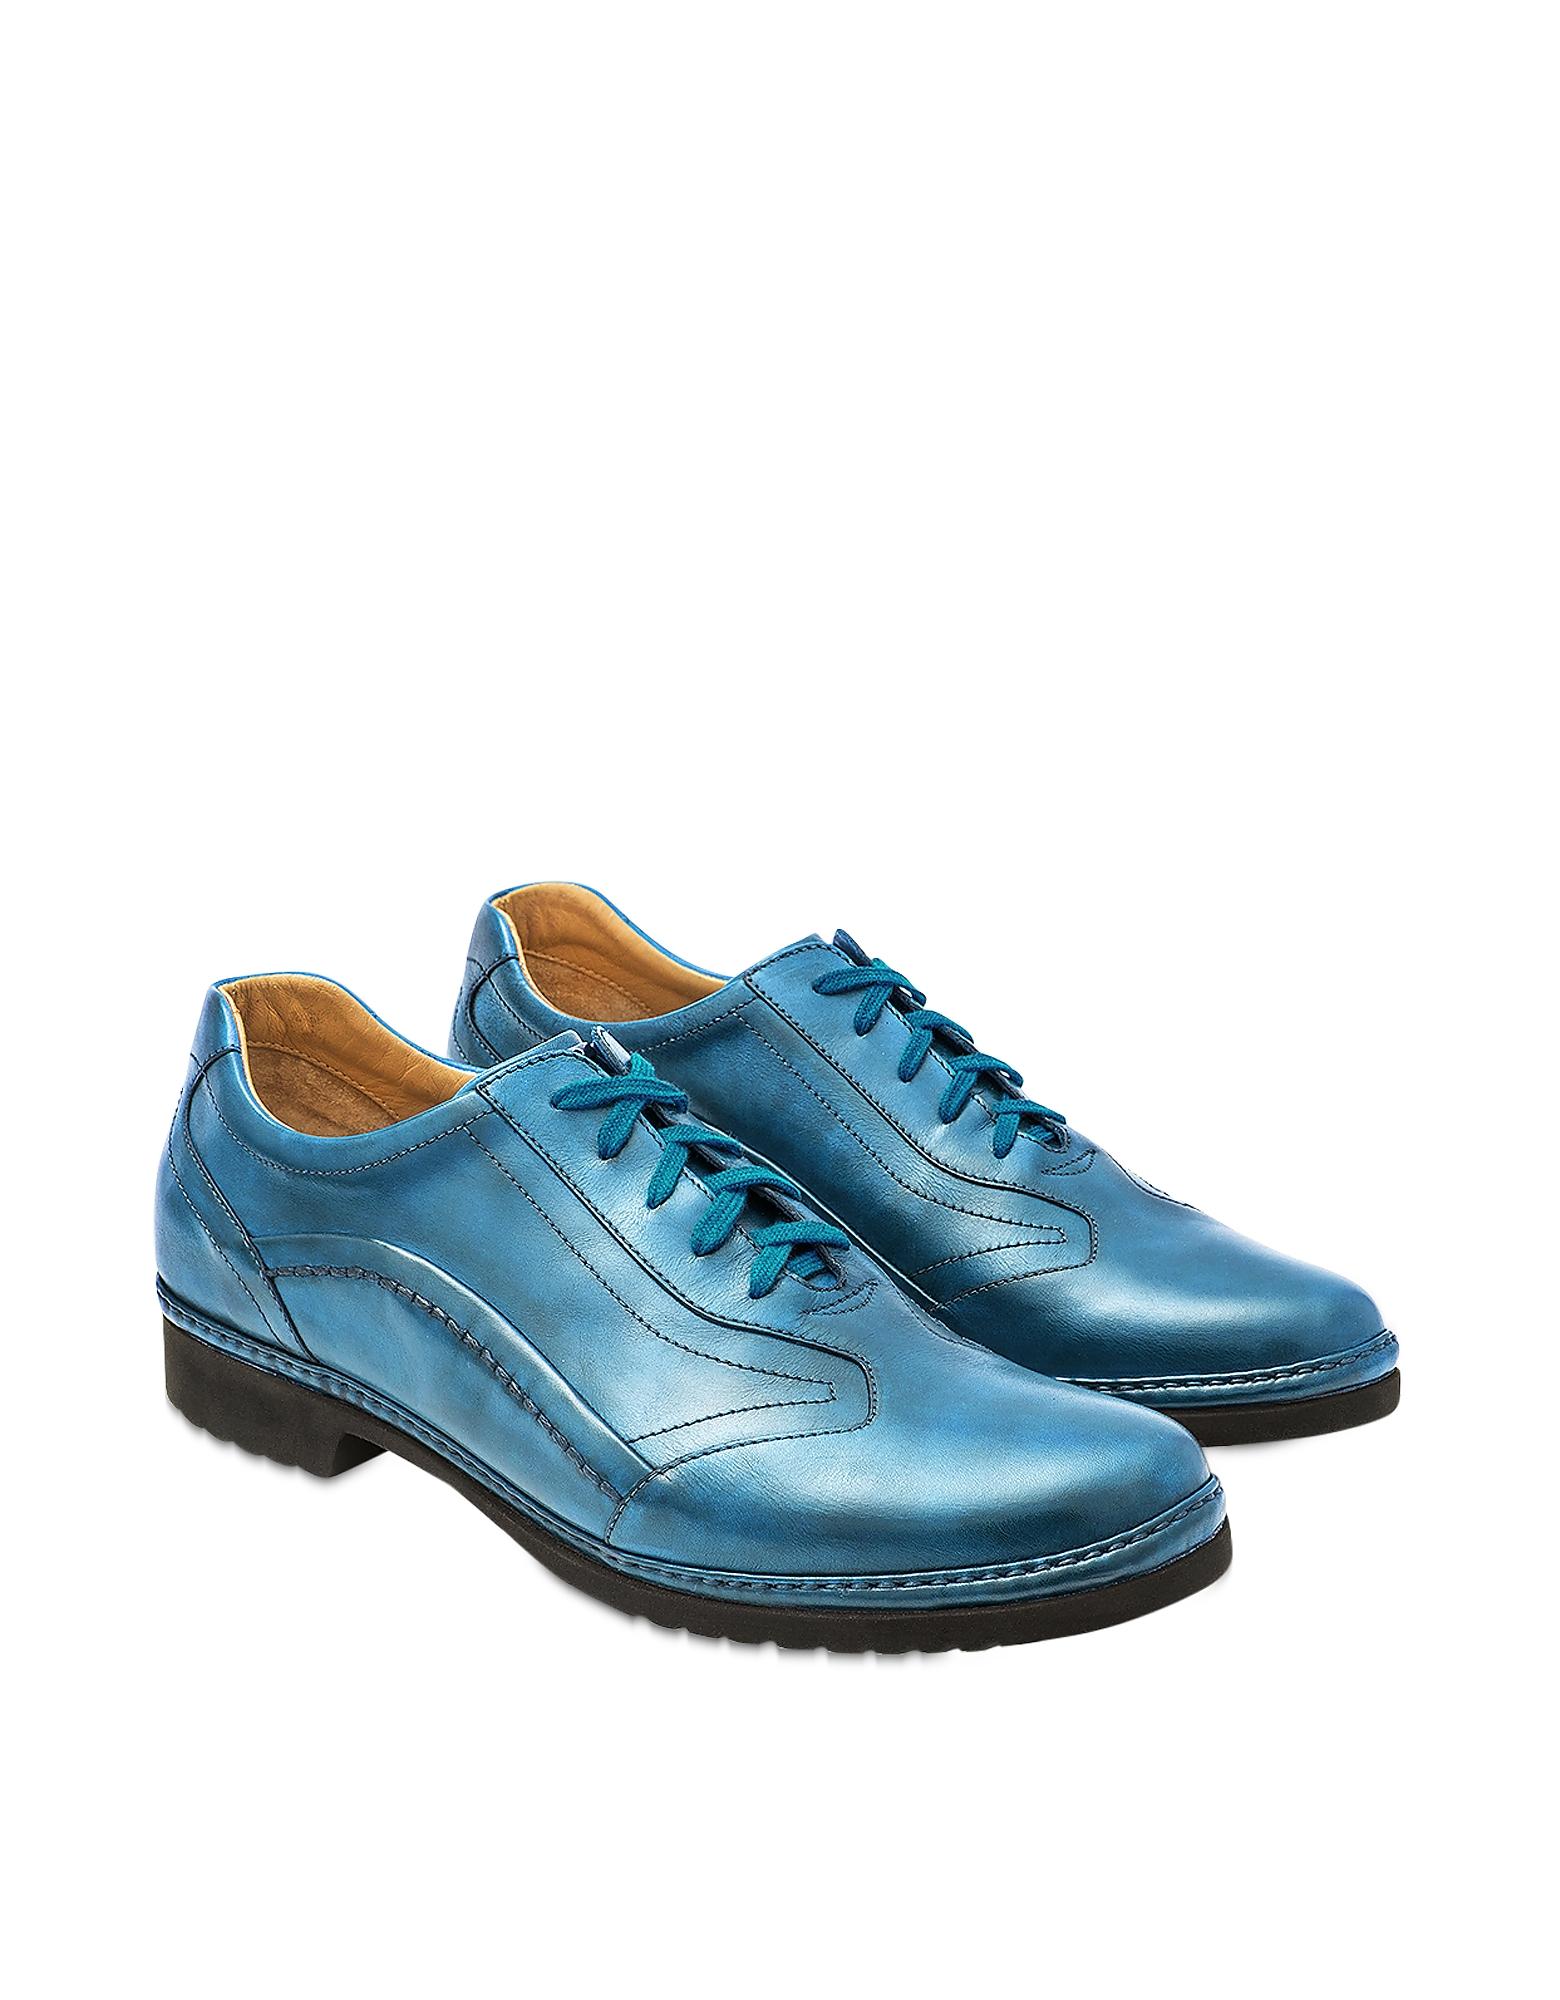 Sky Blue Italian Handmade Leather Lace-up Shoes